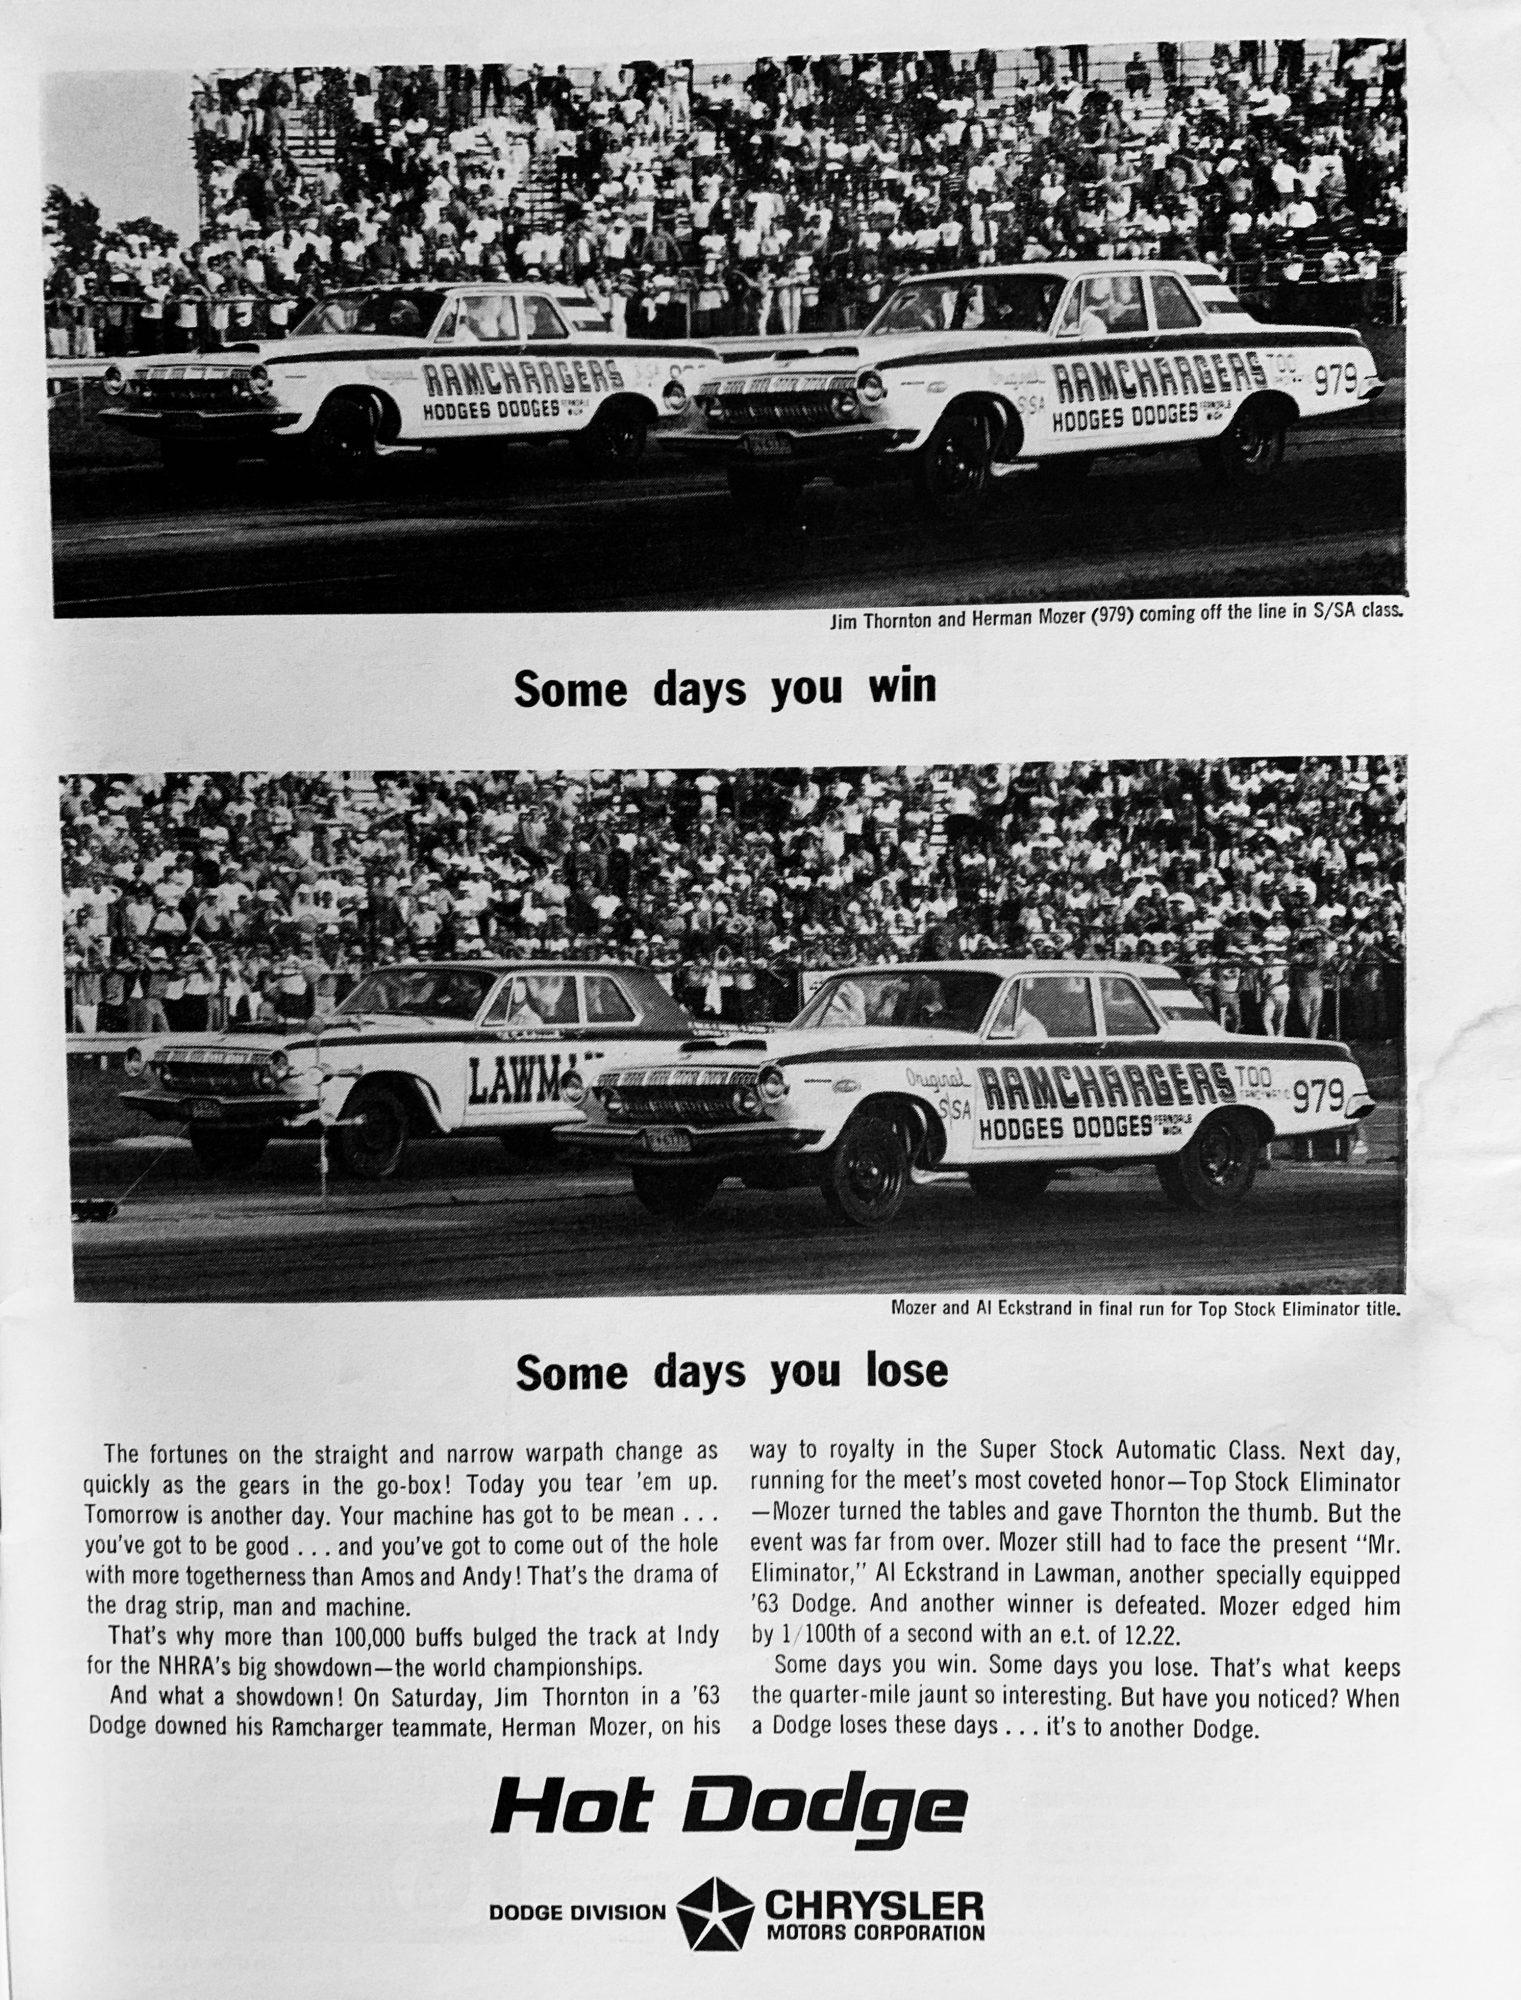 Super Stock Dodge advertisement